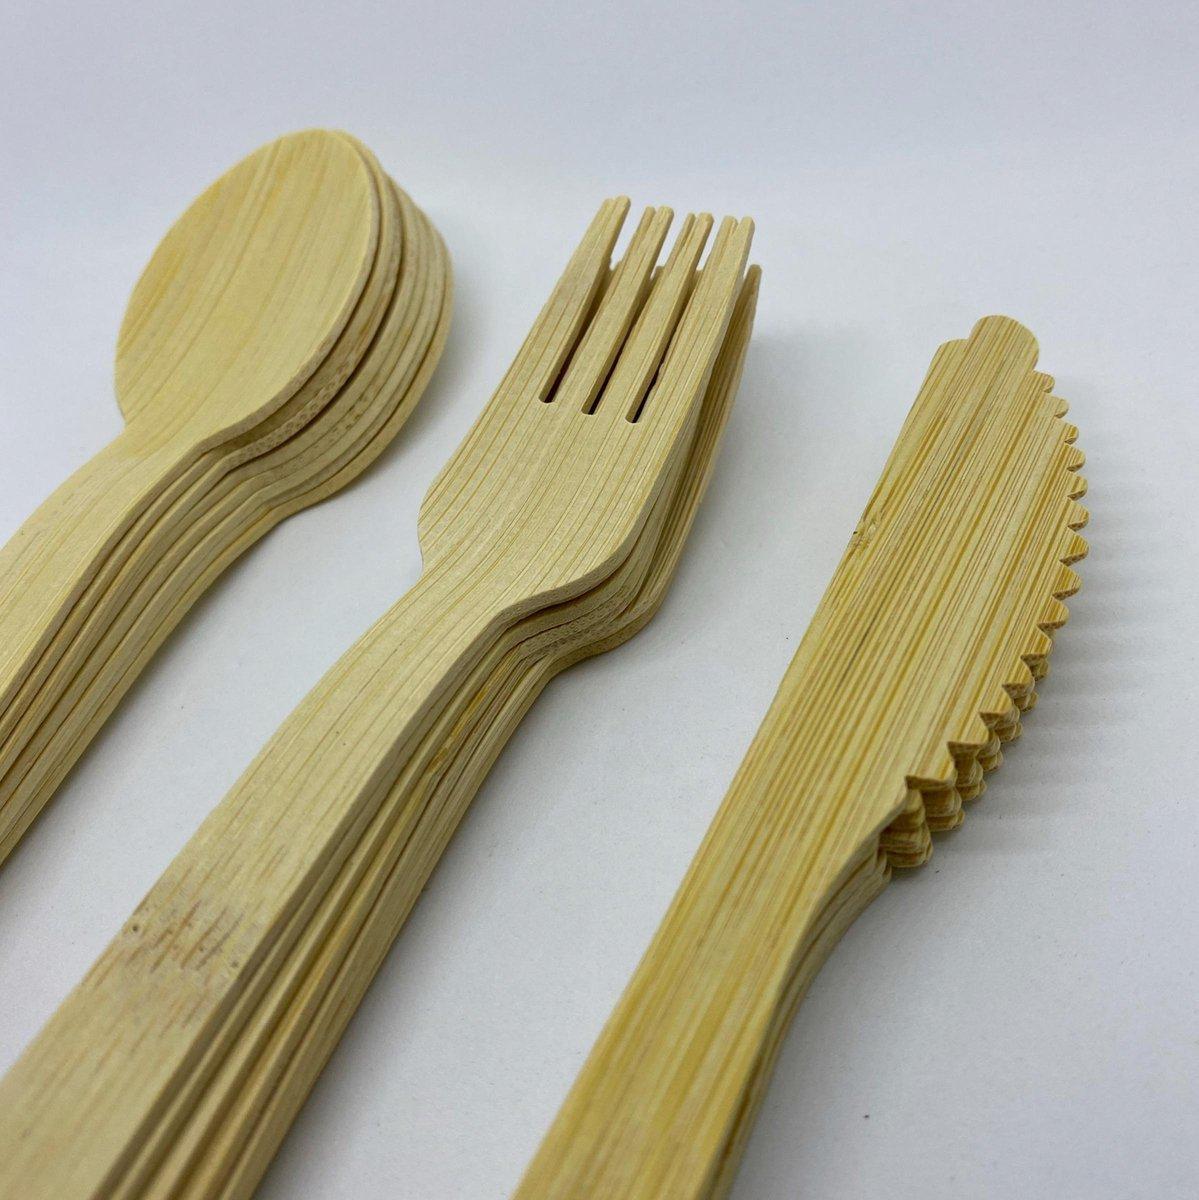 Bamboe Bestek - Bio Bestek (24 Pcs) Wegwerp bestek - Biologisch afbreekbaar - Milieuvriendelijk - 100% Bamboe